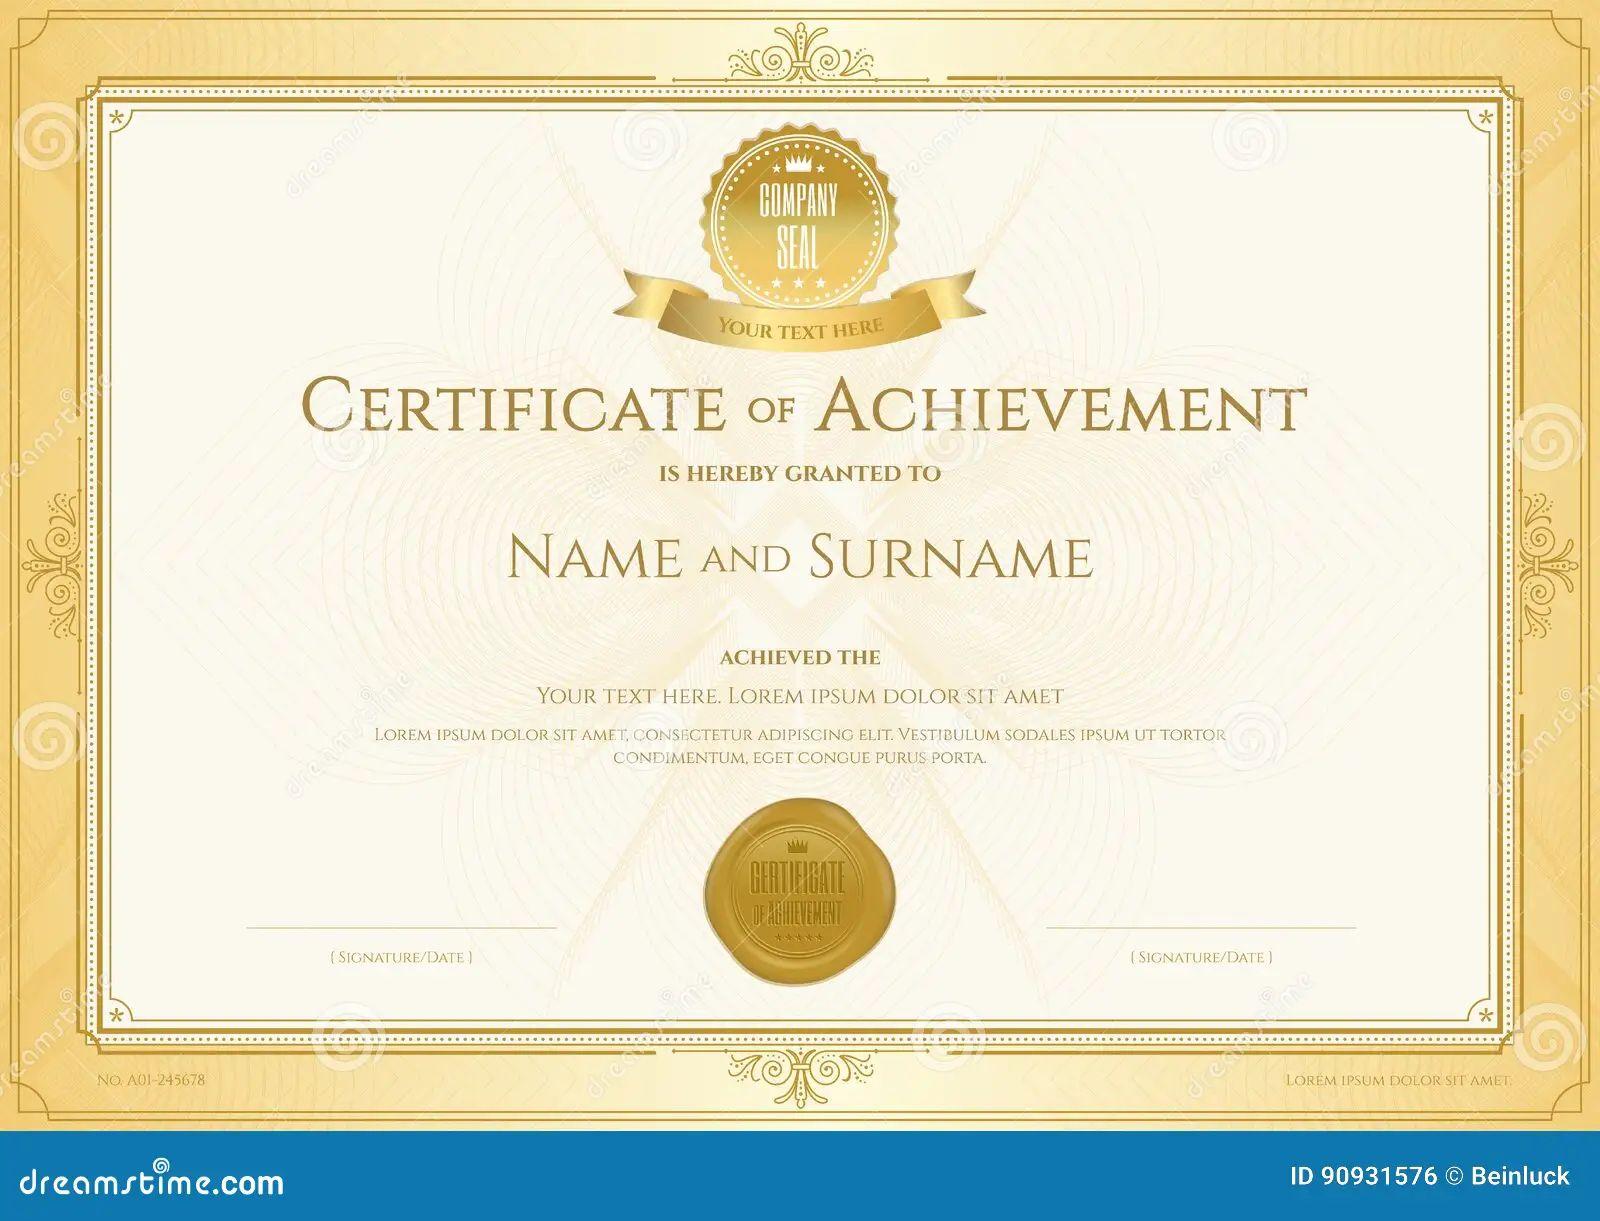 achievment certificate